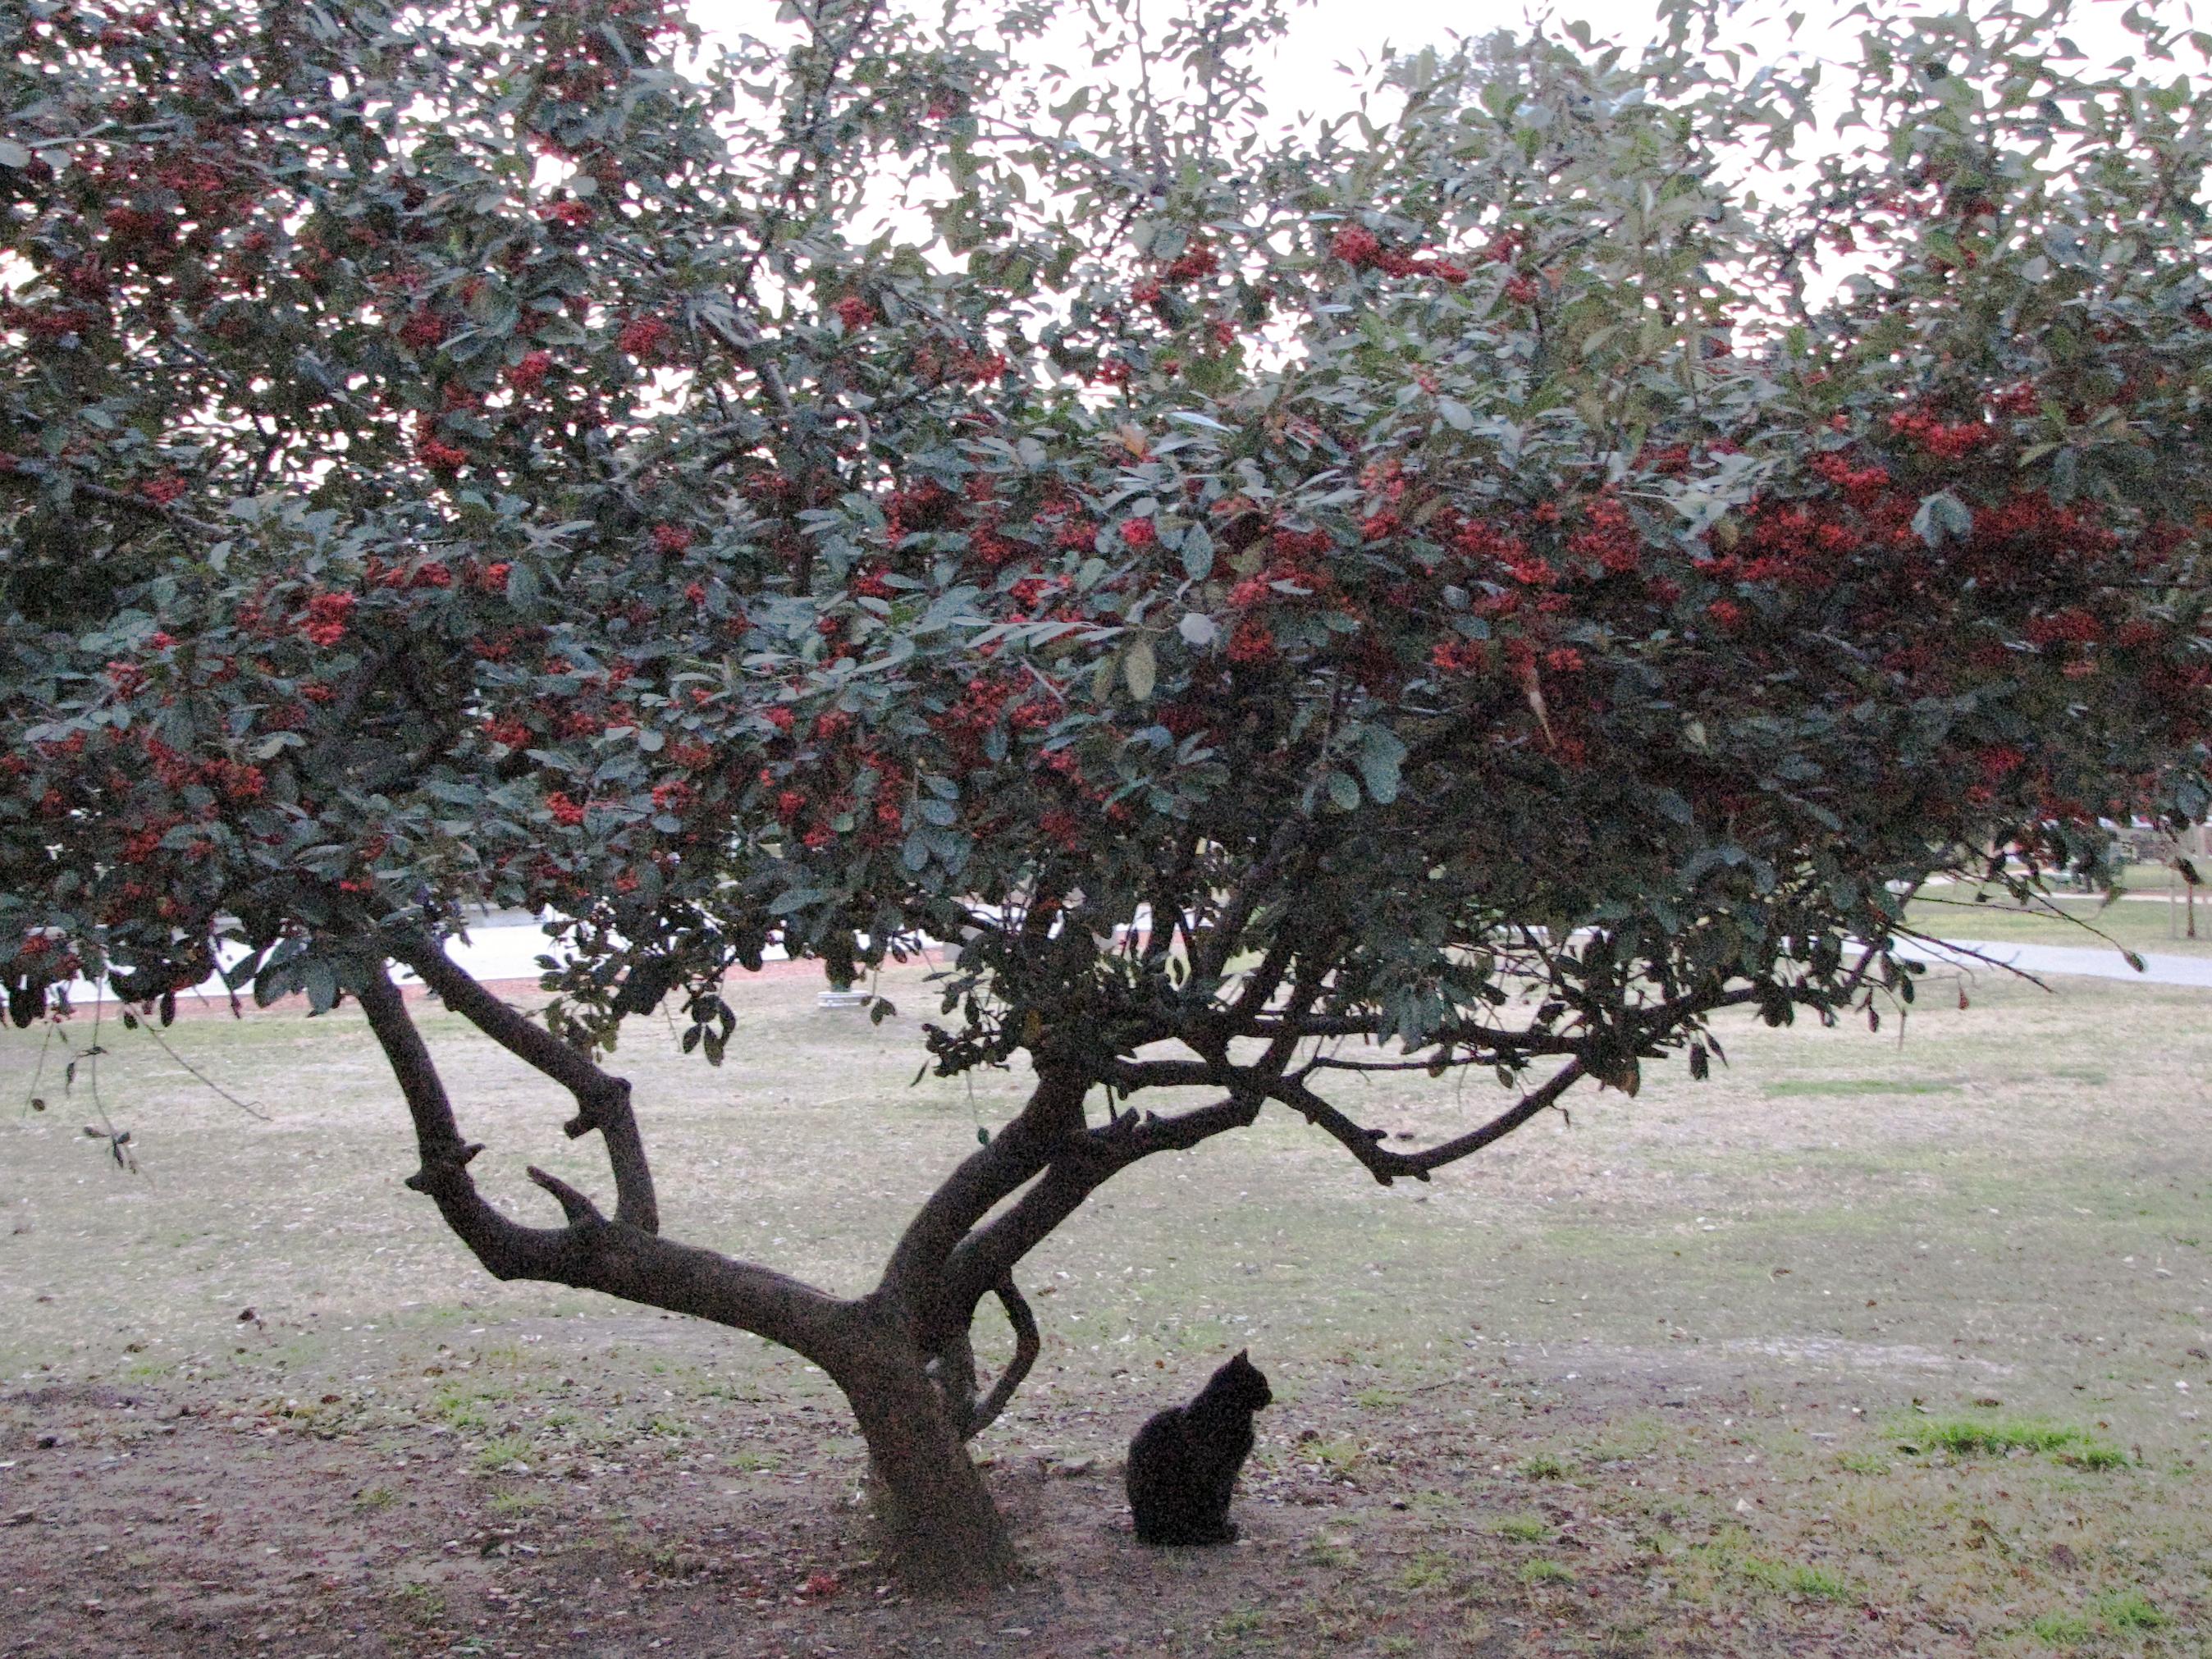 Black cat under tree photo